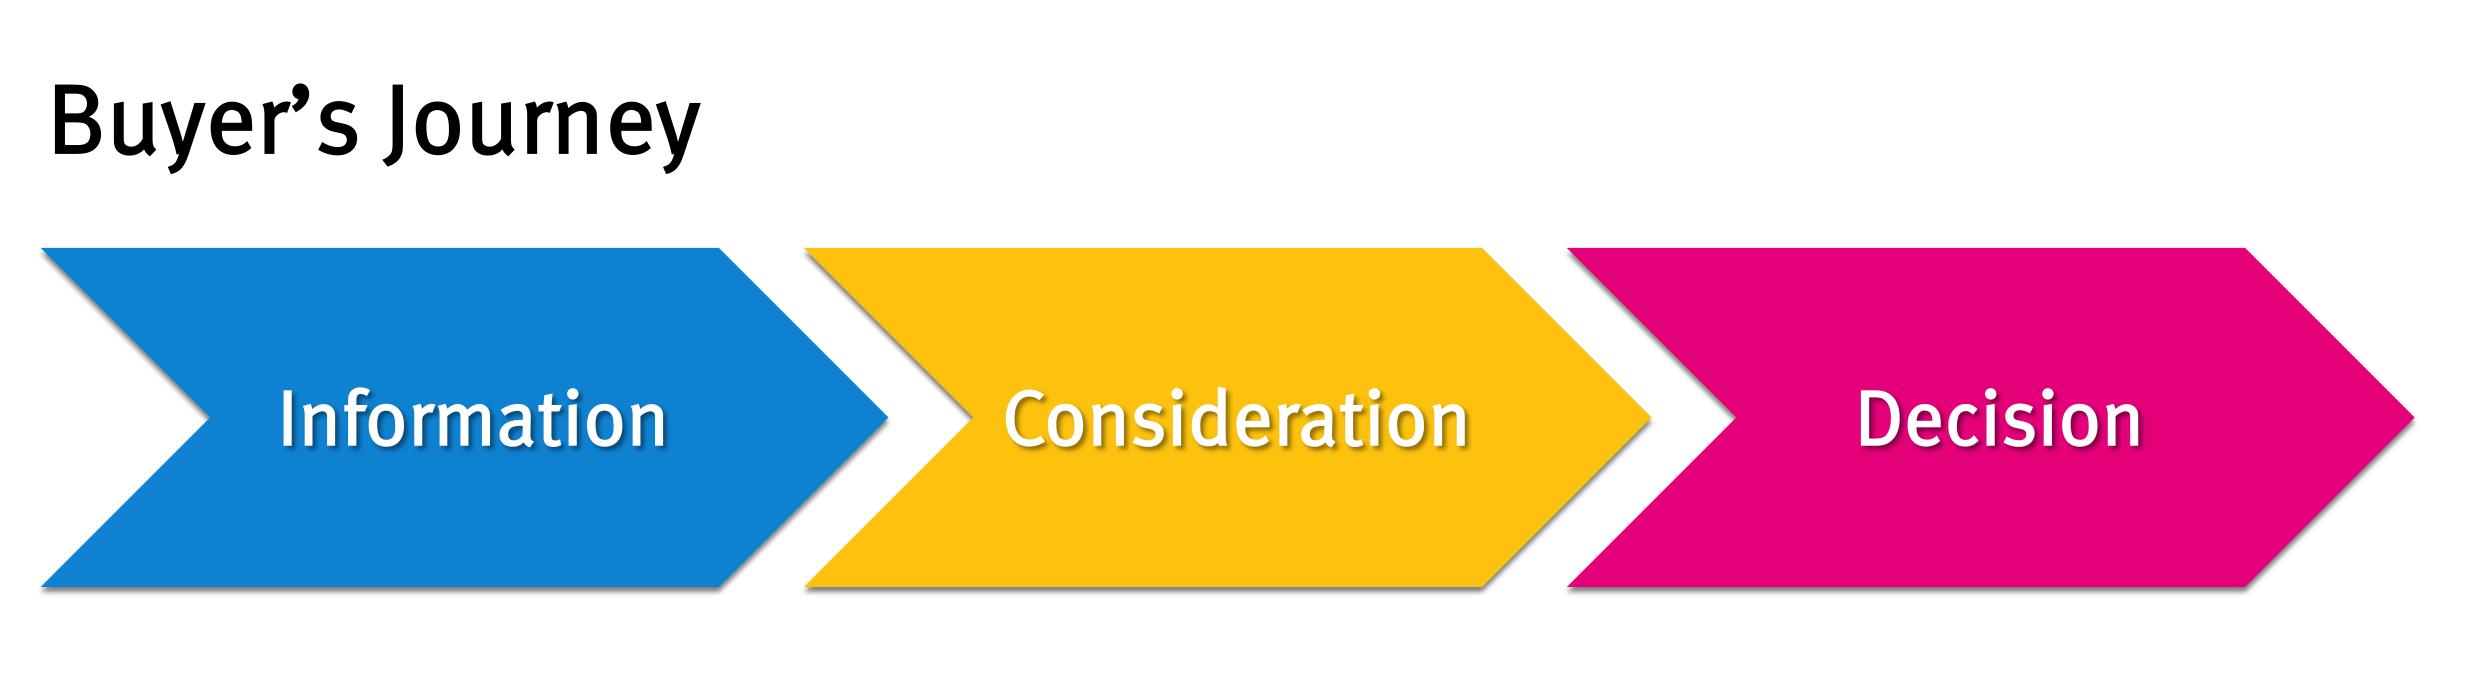 buyers journey information consideration inbound decision